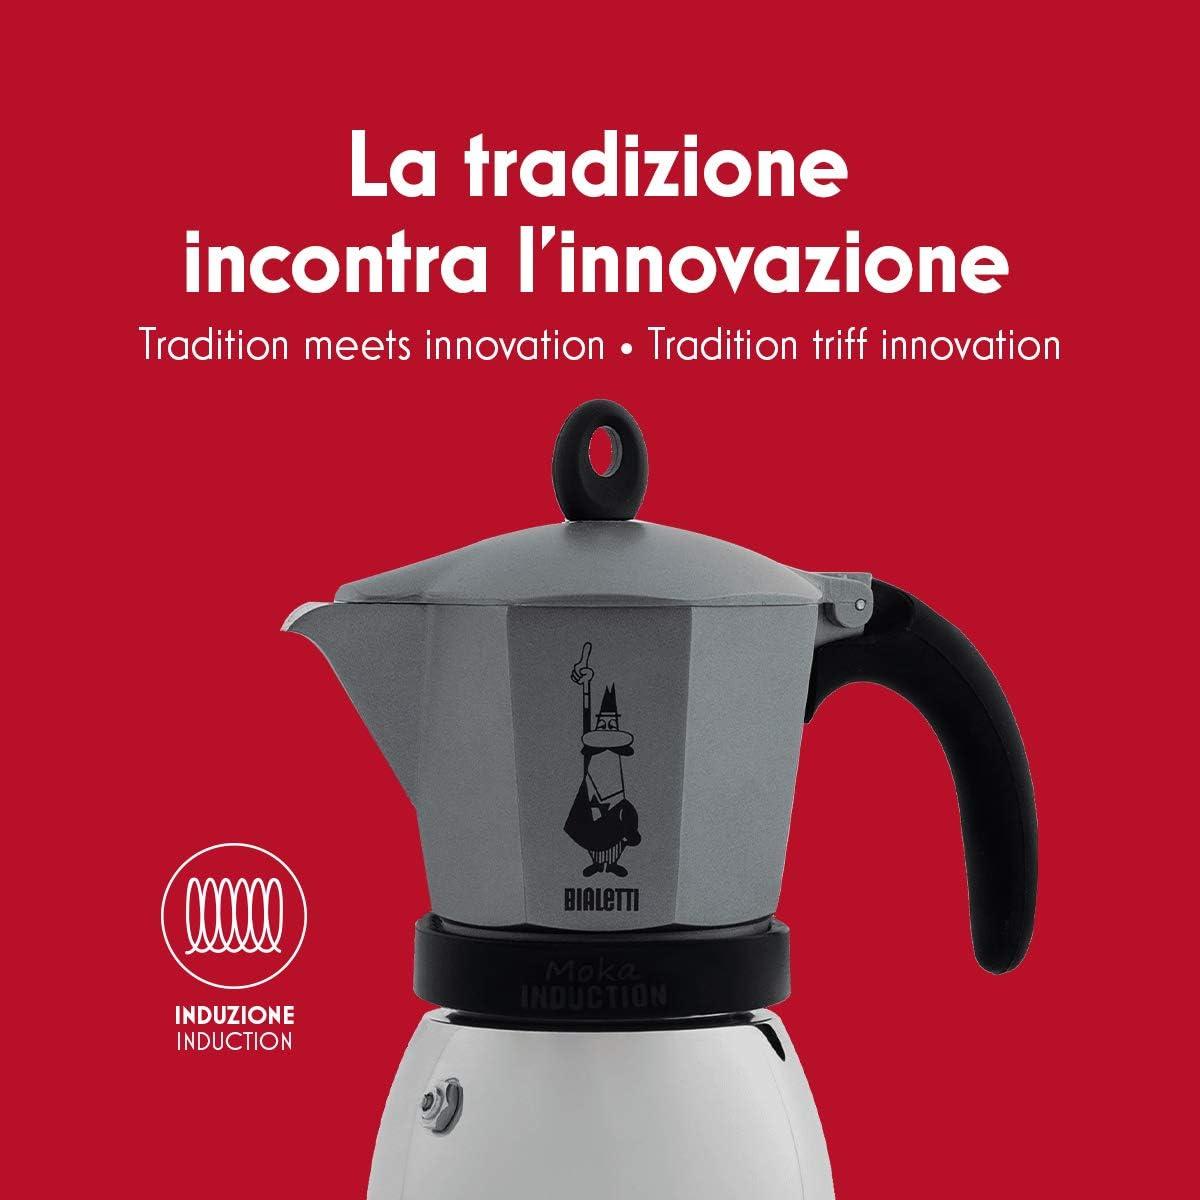 Bialetti Moka Induction Cafetera Italiana Espresso por inducción, Aluminio, Oro (Champagne), 3 Tazas: Amazon.es: Hogar